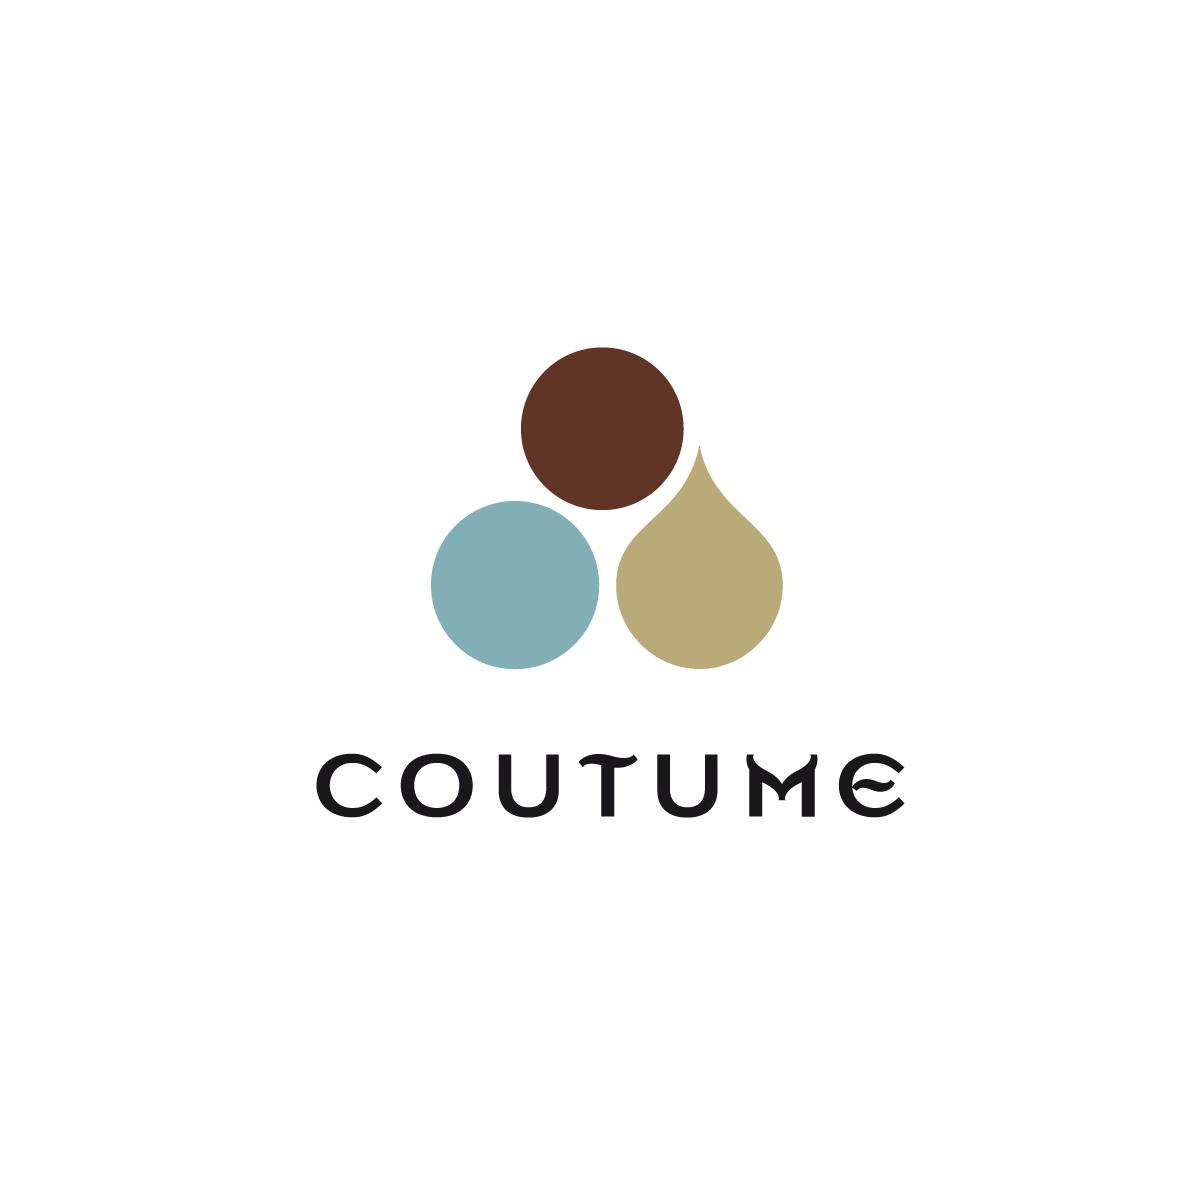 Coutume Logo JPEG copy.jpg